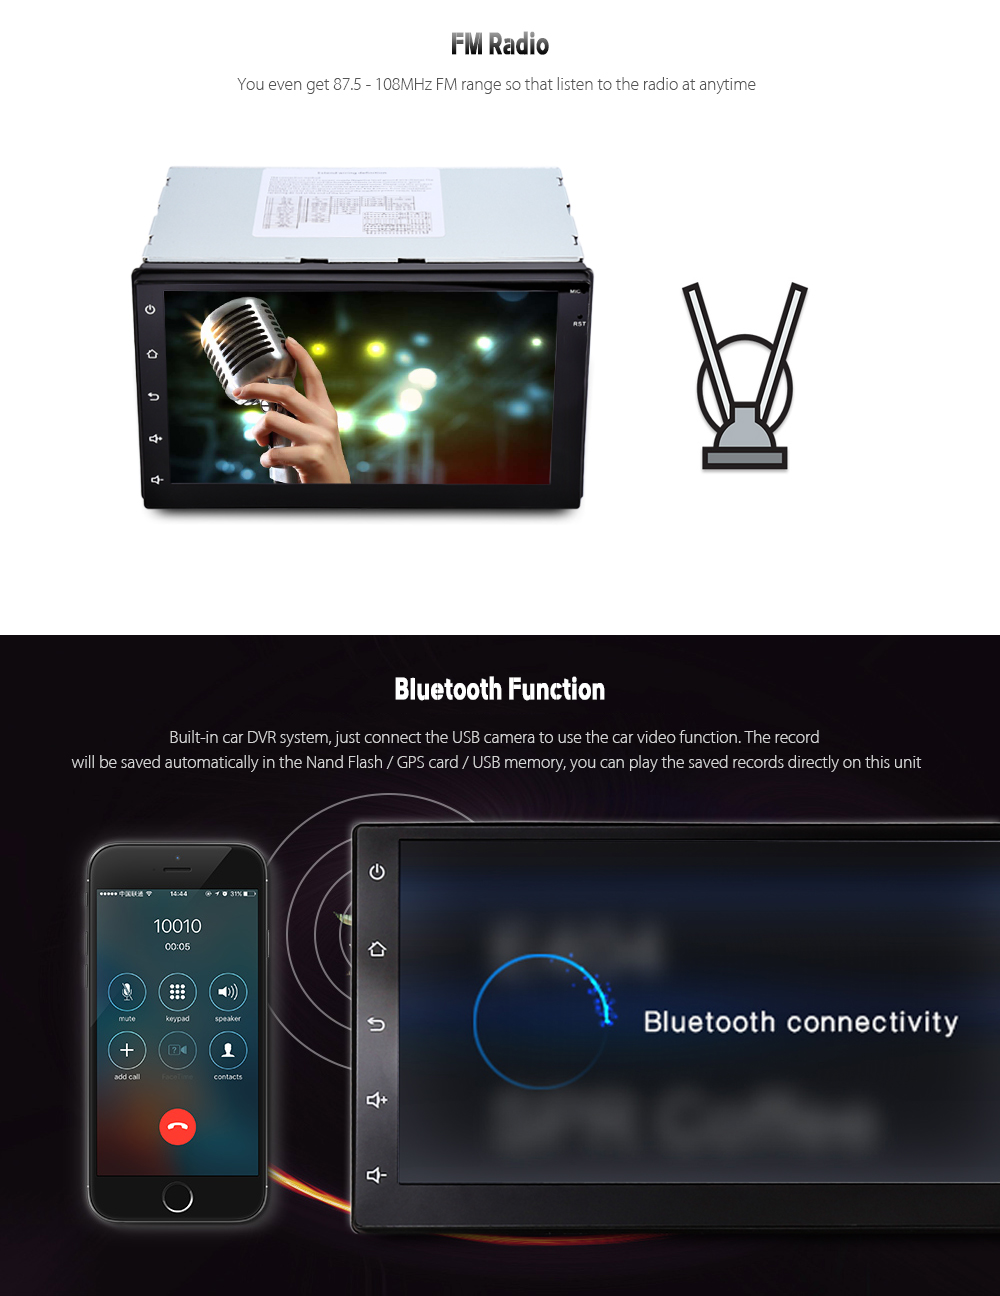 7003 android 6 0 gps navigation de voiture lecteur multim dia 2 din voiture radio lecteur. Black Bedroom Furniture Sets. Home Design Ideas